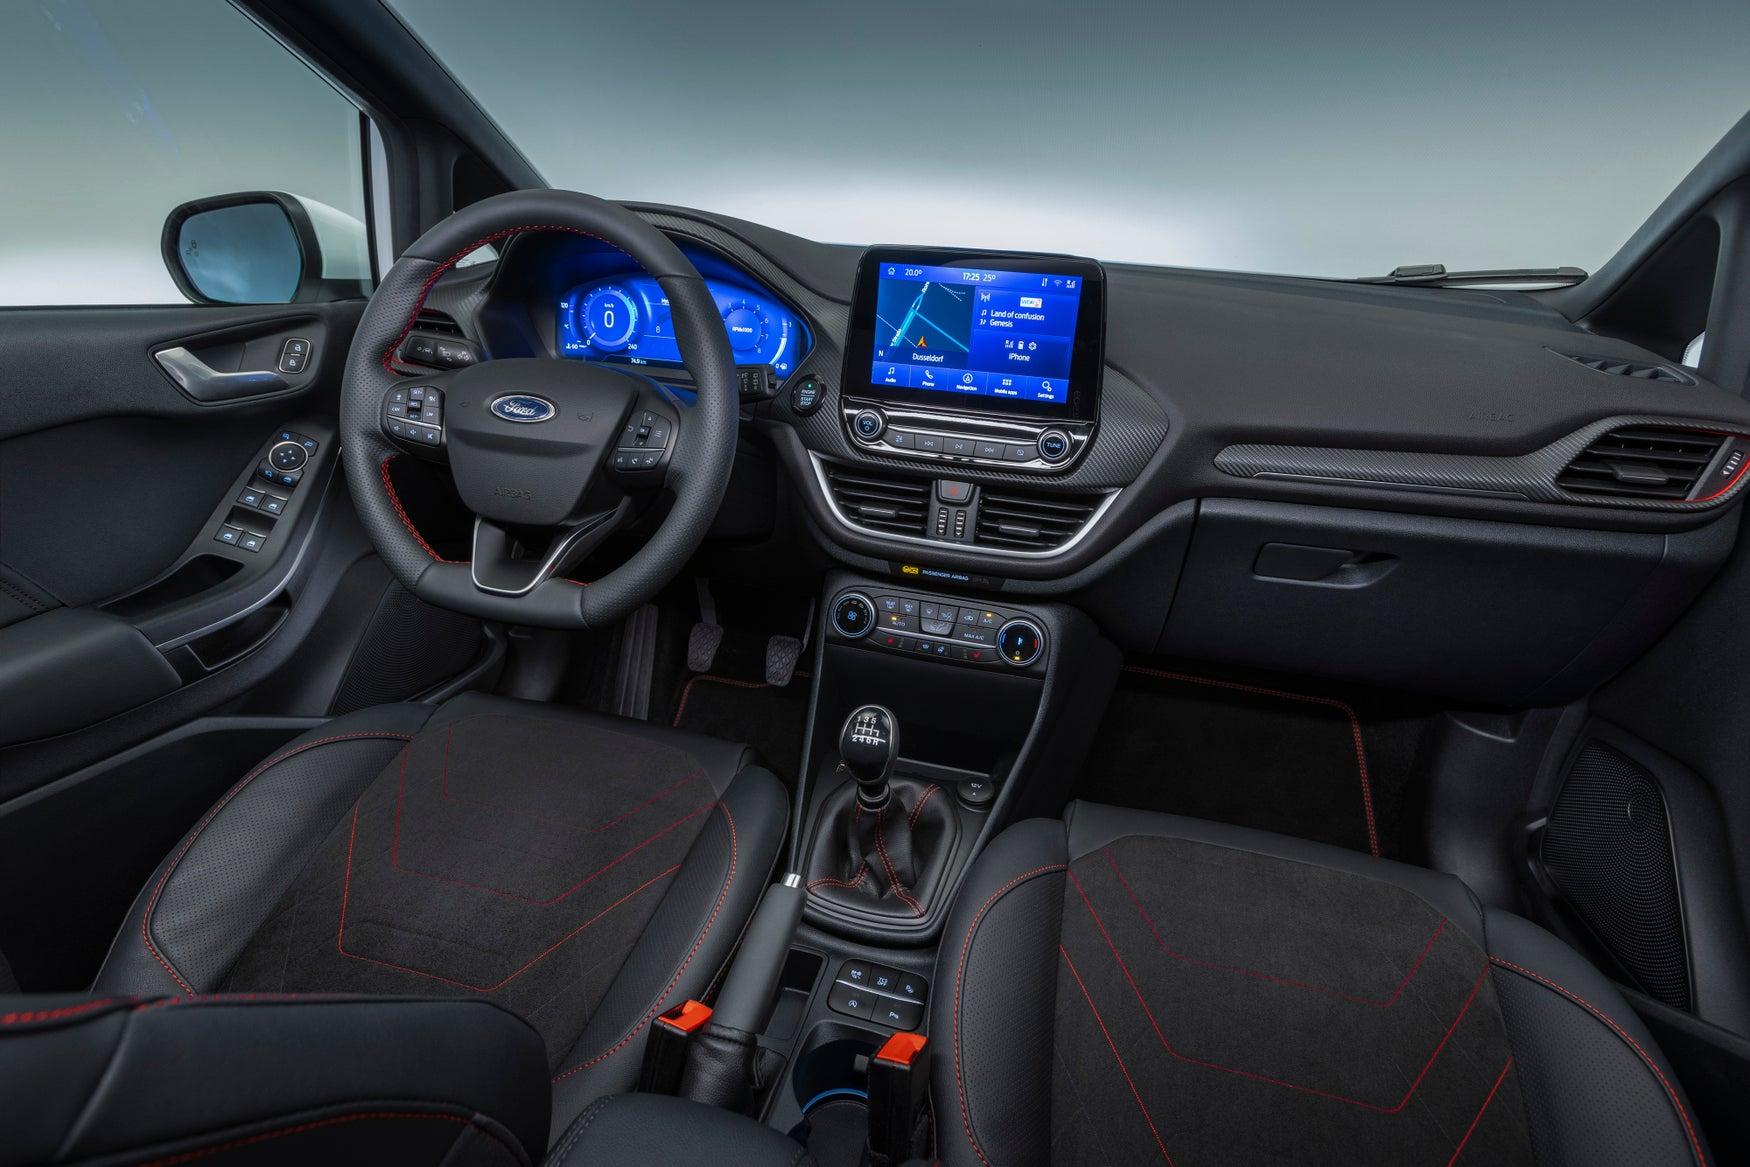 Ford Fiesta 2021 interior